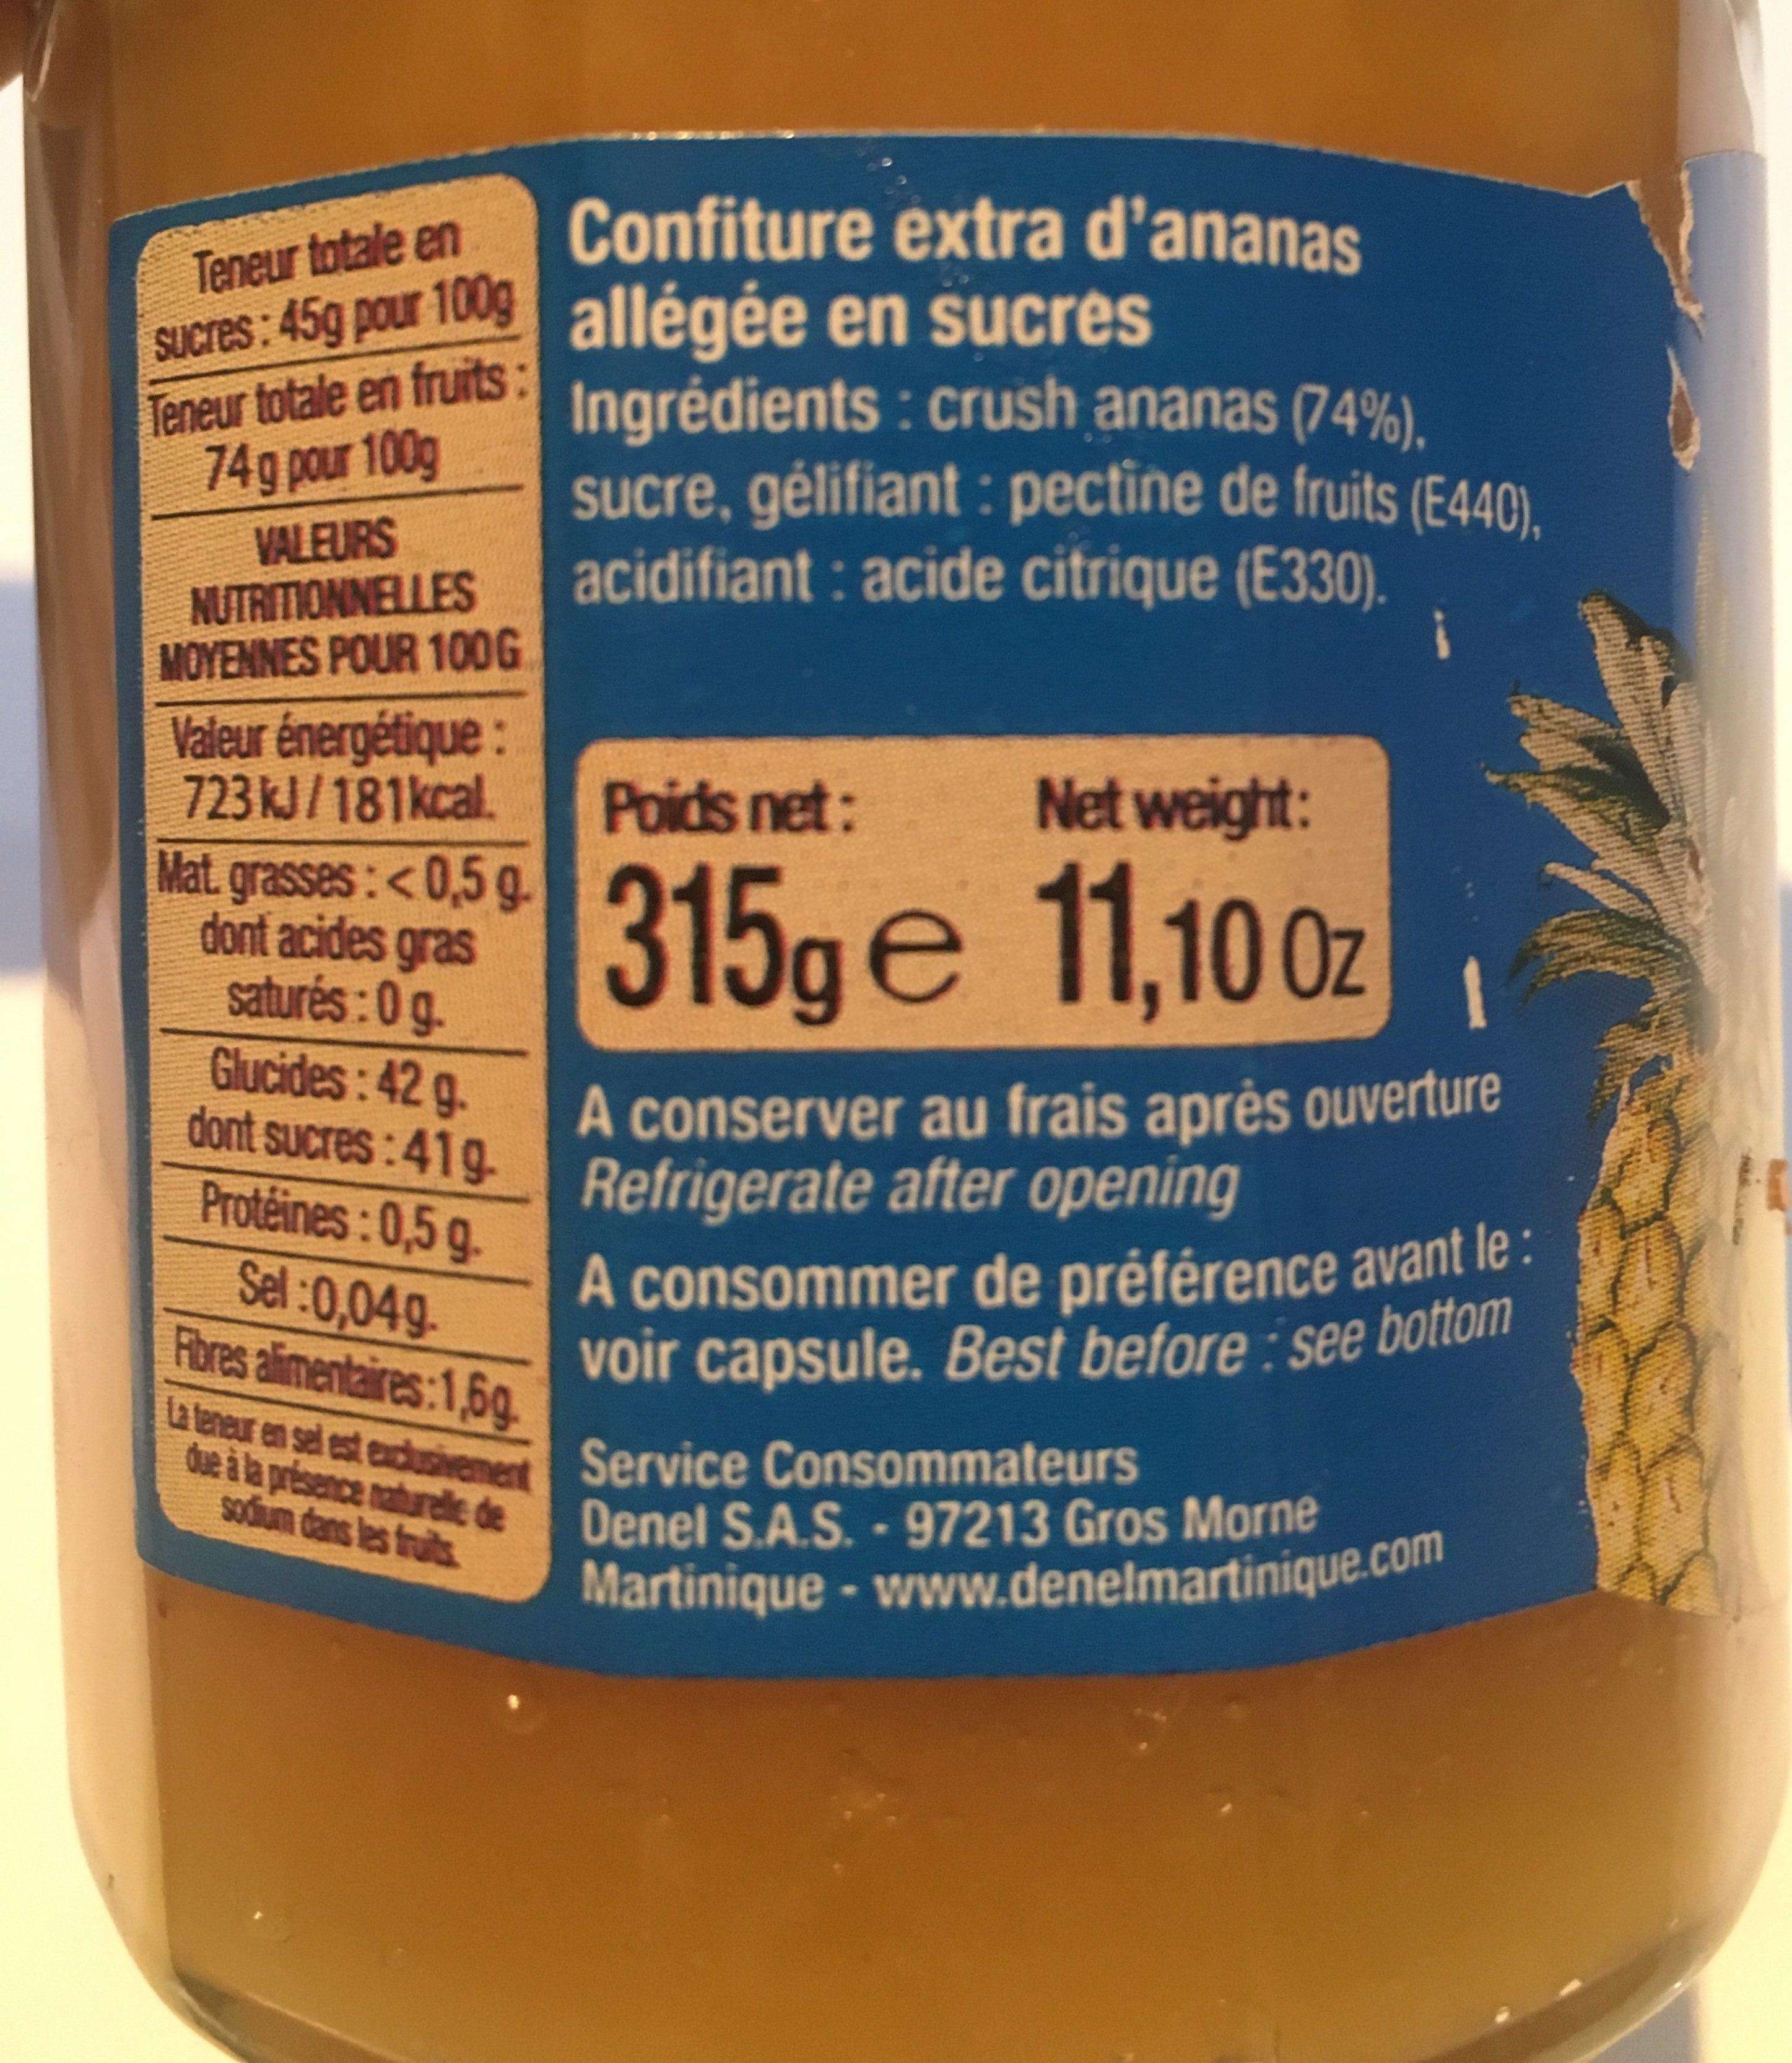 Confiture allégée ananas - Inhaltsstoffe - fr